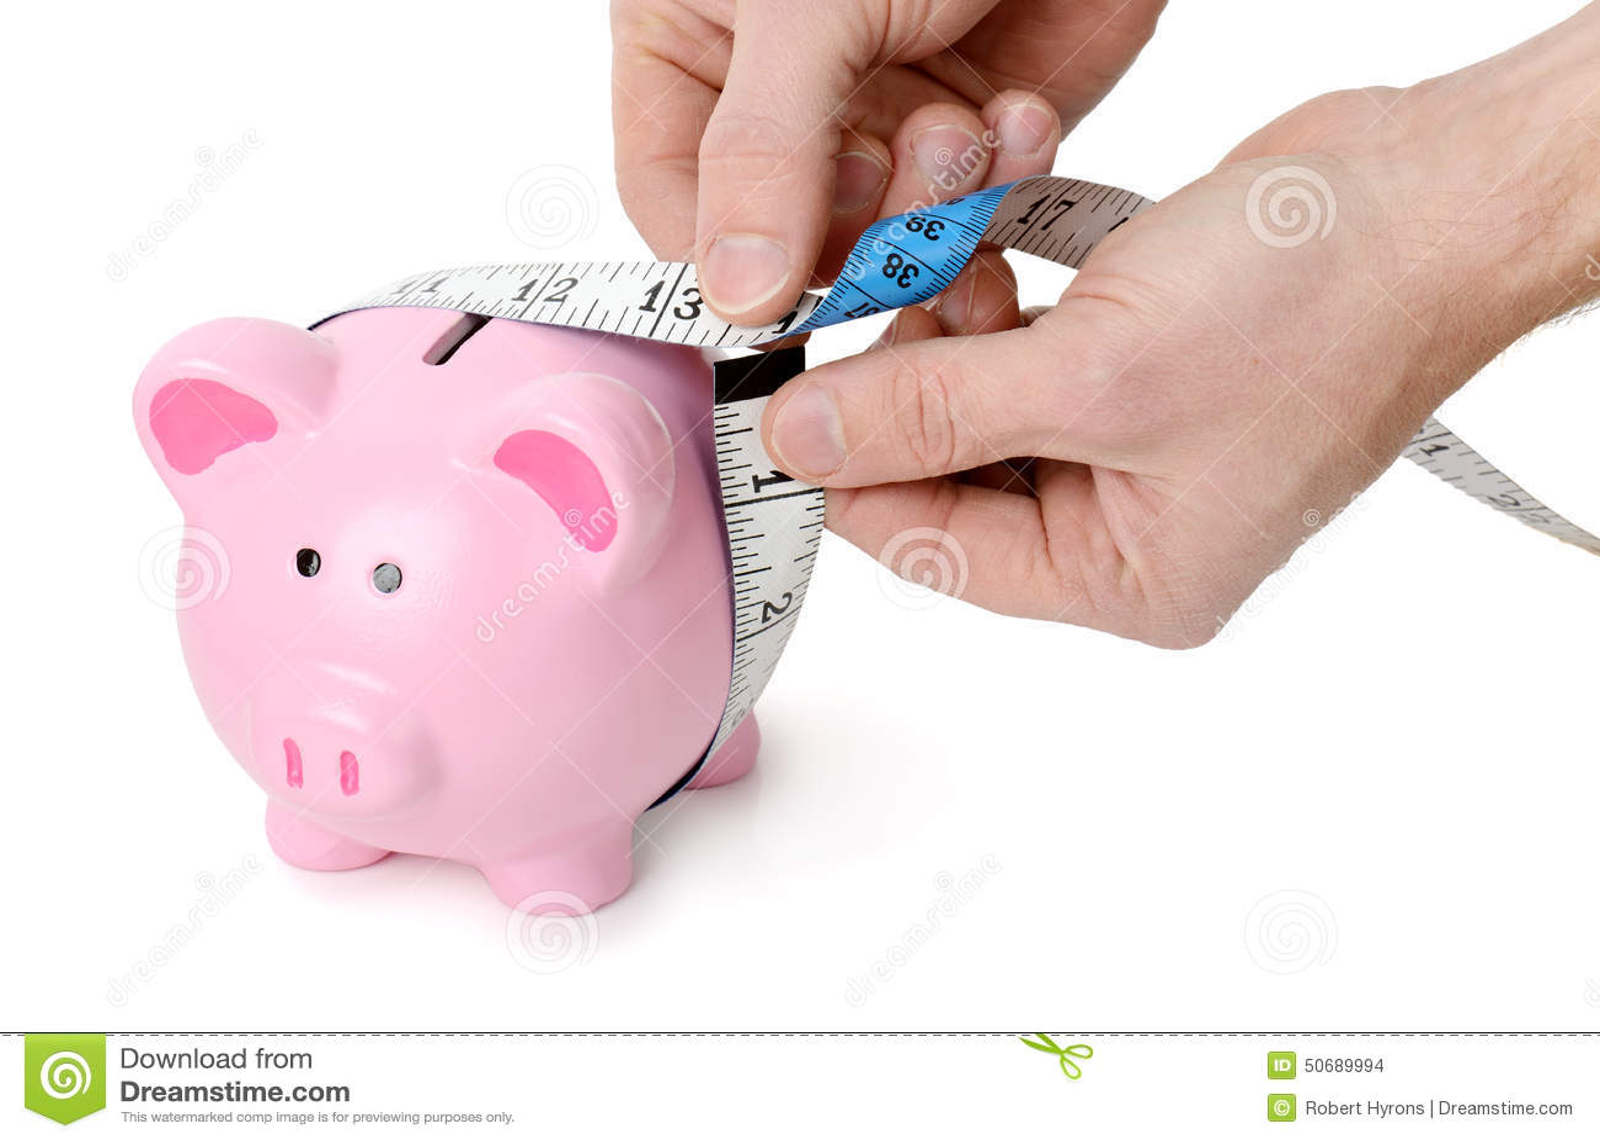 Download 评定的货币 库存照片. 图片 包括有 现有量, 咬嚼, 评定, 背包, 经济, 概念, 消沉, 班卓琵琶 - 50689994